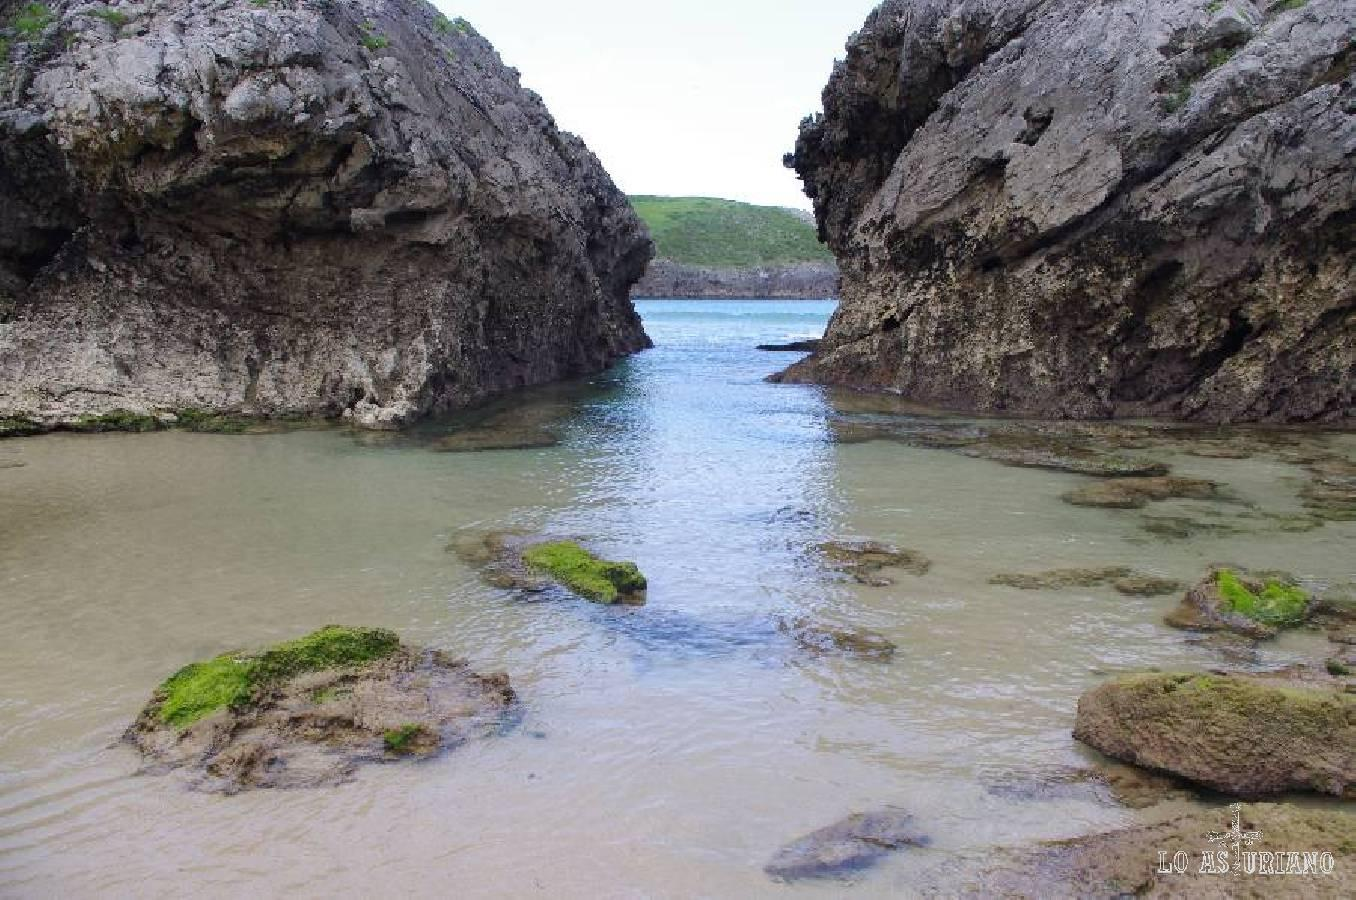 Agua cristalina en la playa de Borizu.